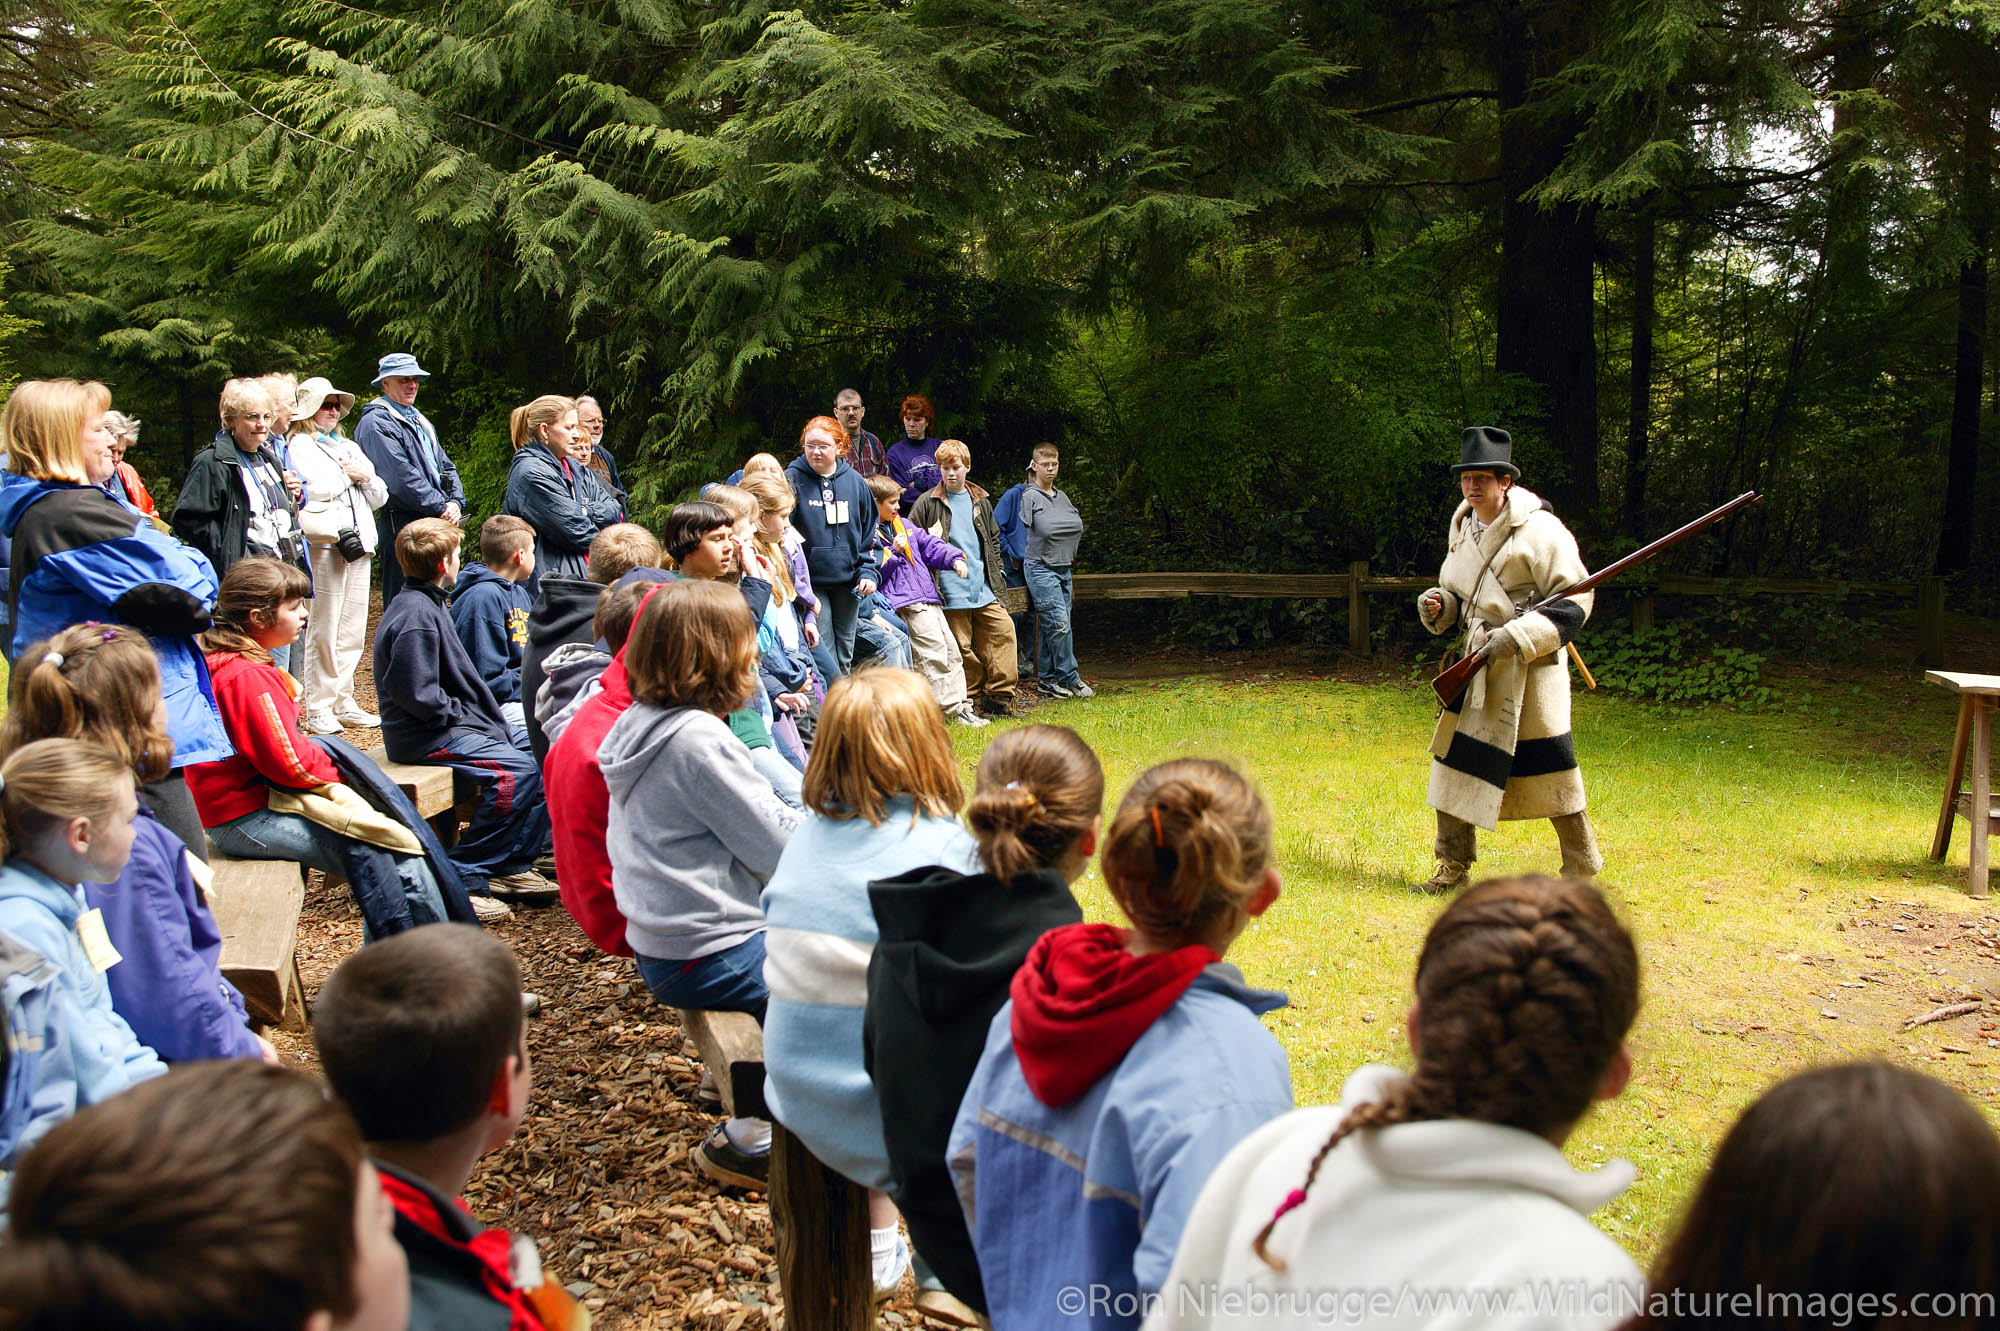 Musketloading rifle demonstration for school children, Fort Clatsop National Memorial, near Astoria, Oregon.